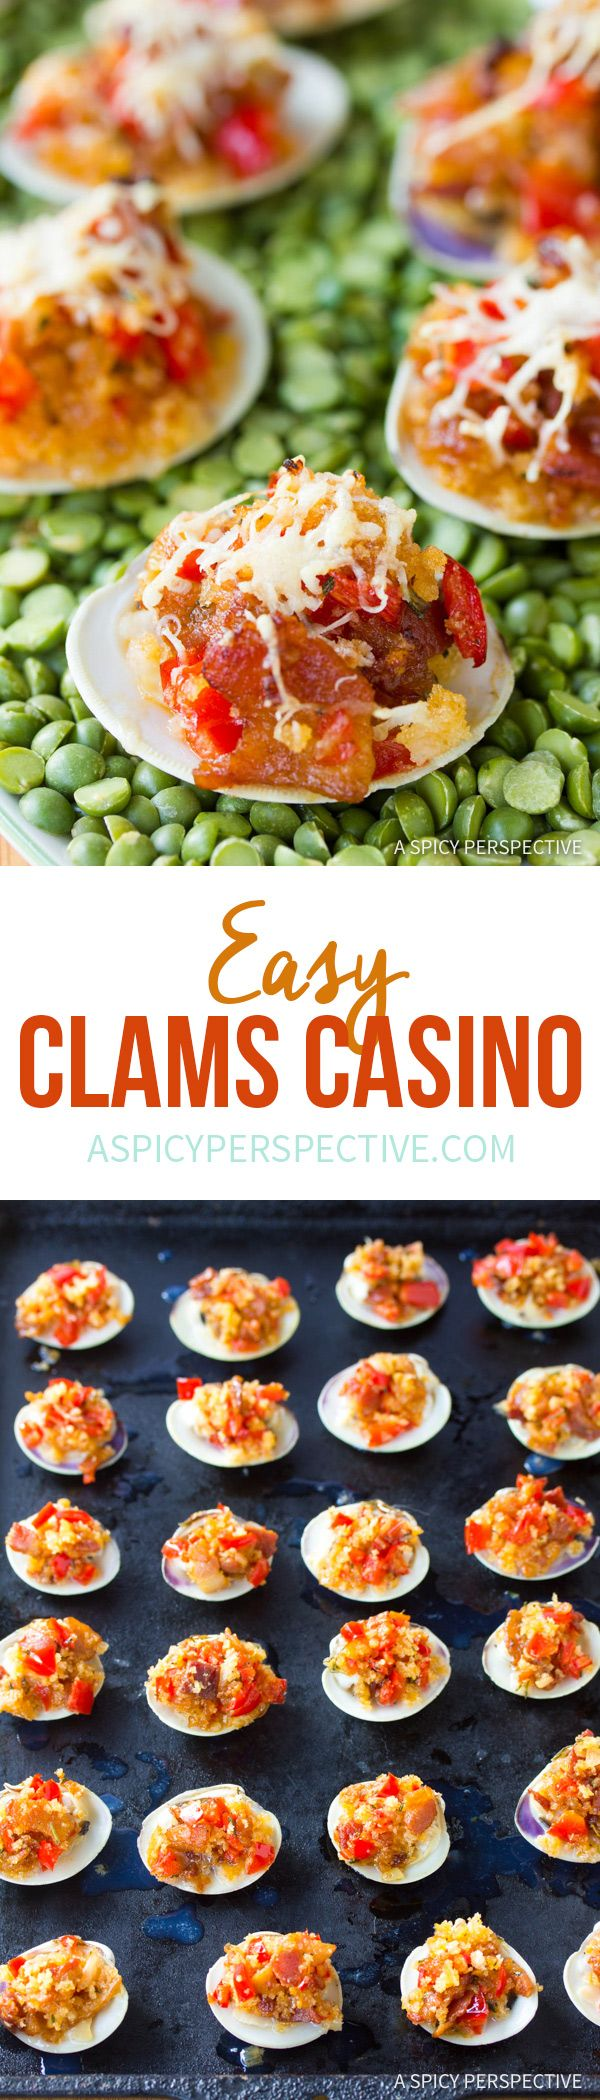 Perfect Clams Casino Recipe | ASpicyPerspective.com